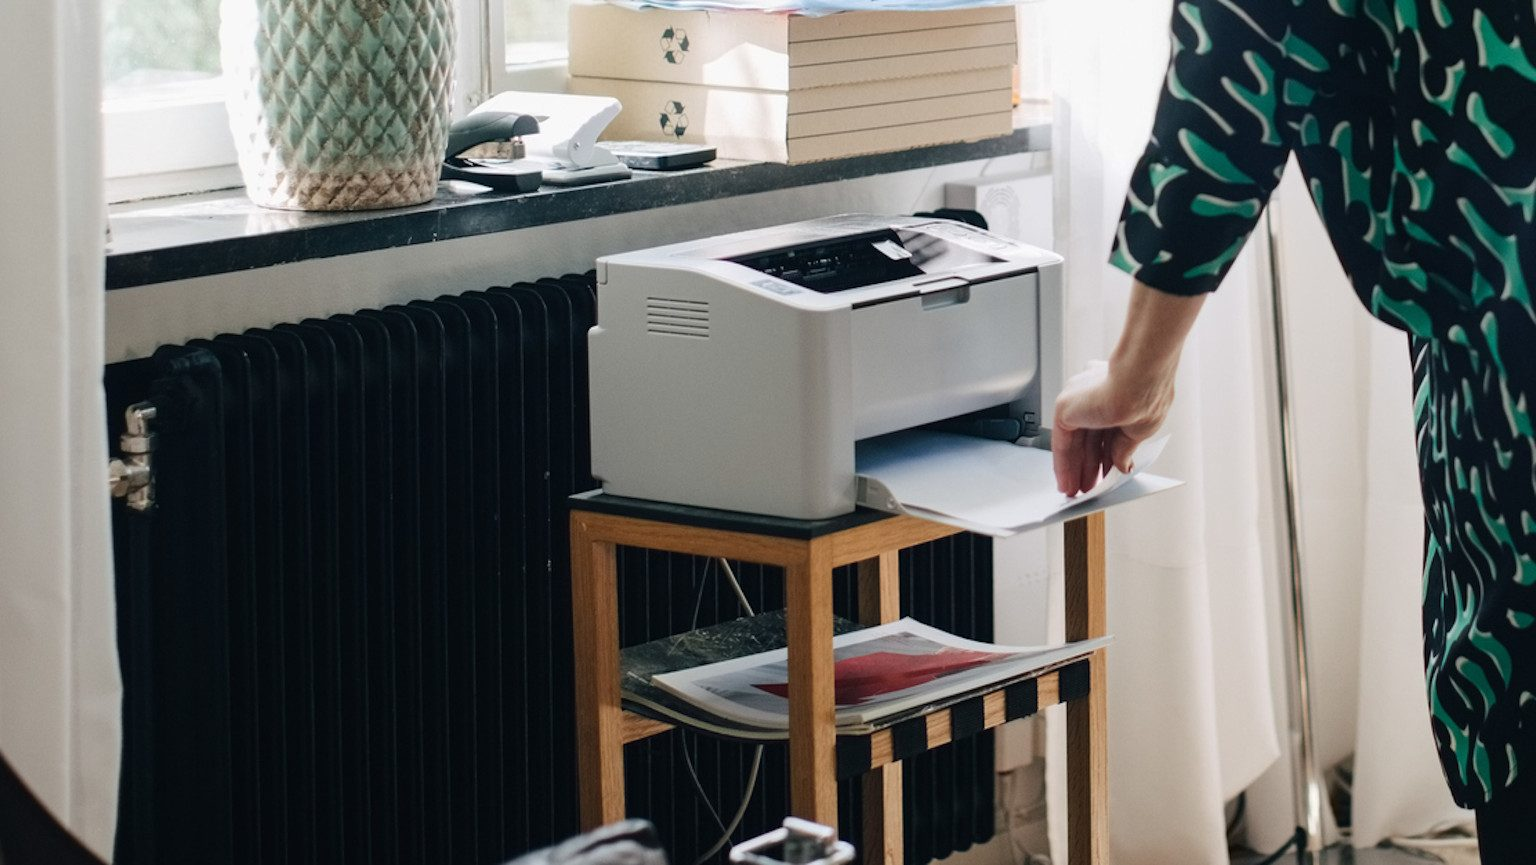 Home office printer